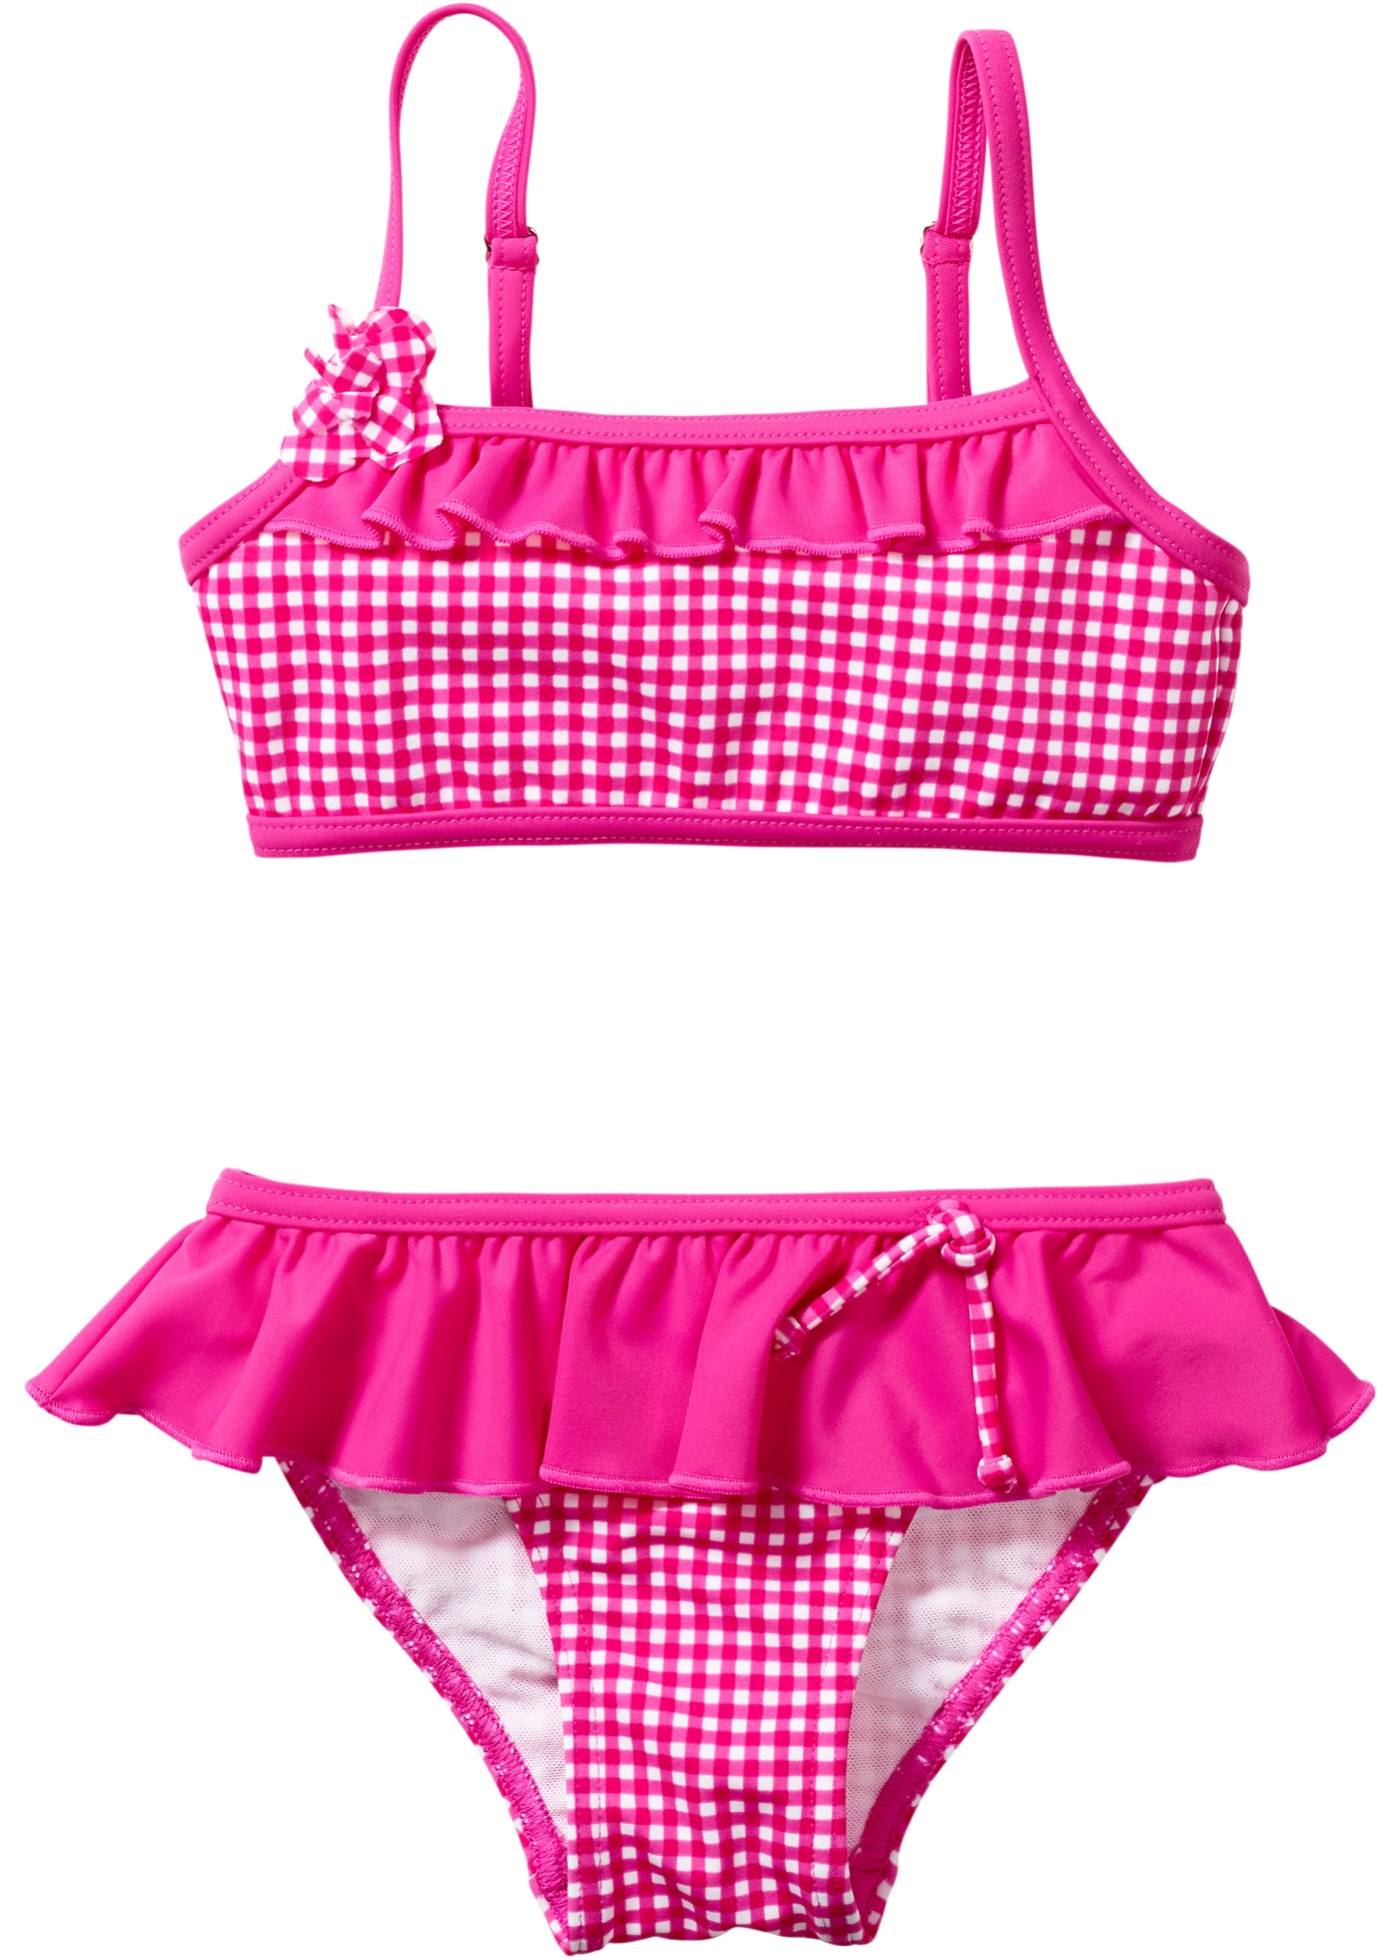 Bikini  Fucsia  - bpc bon